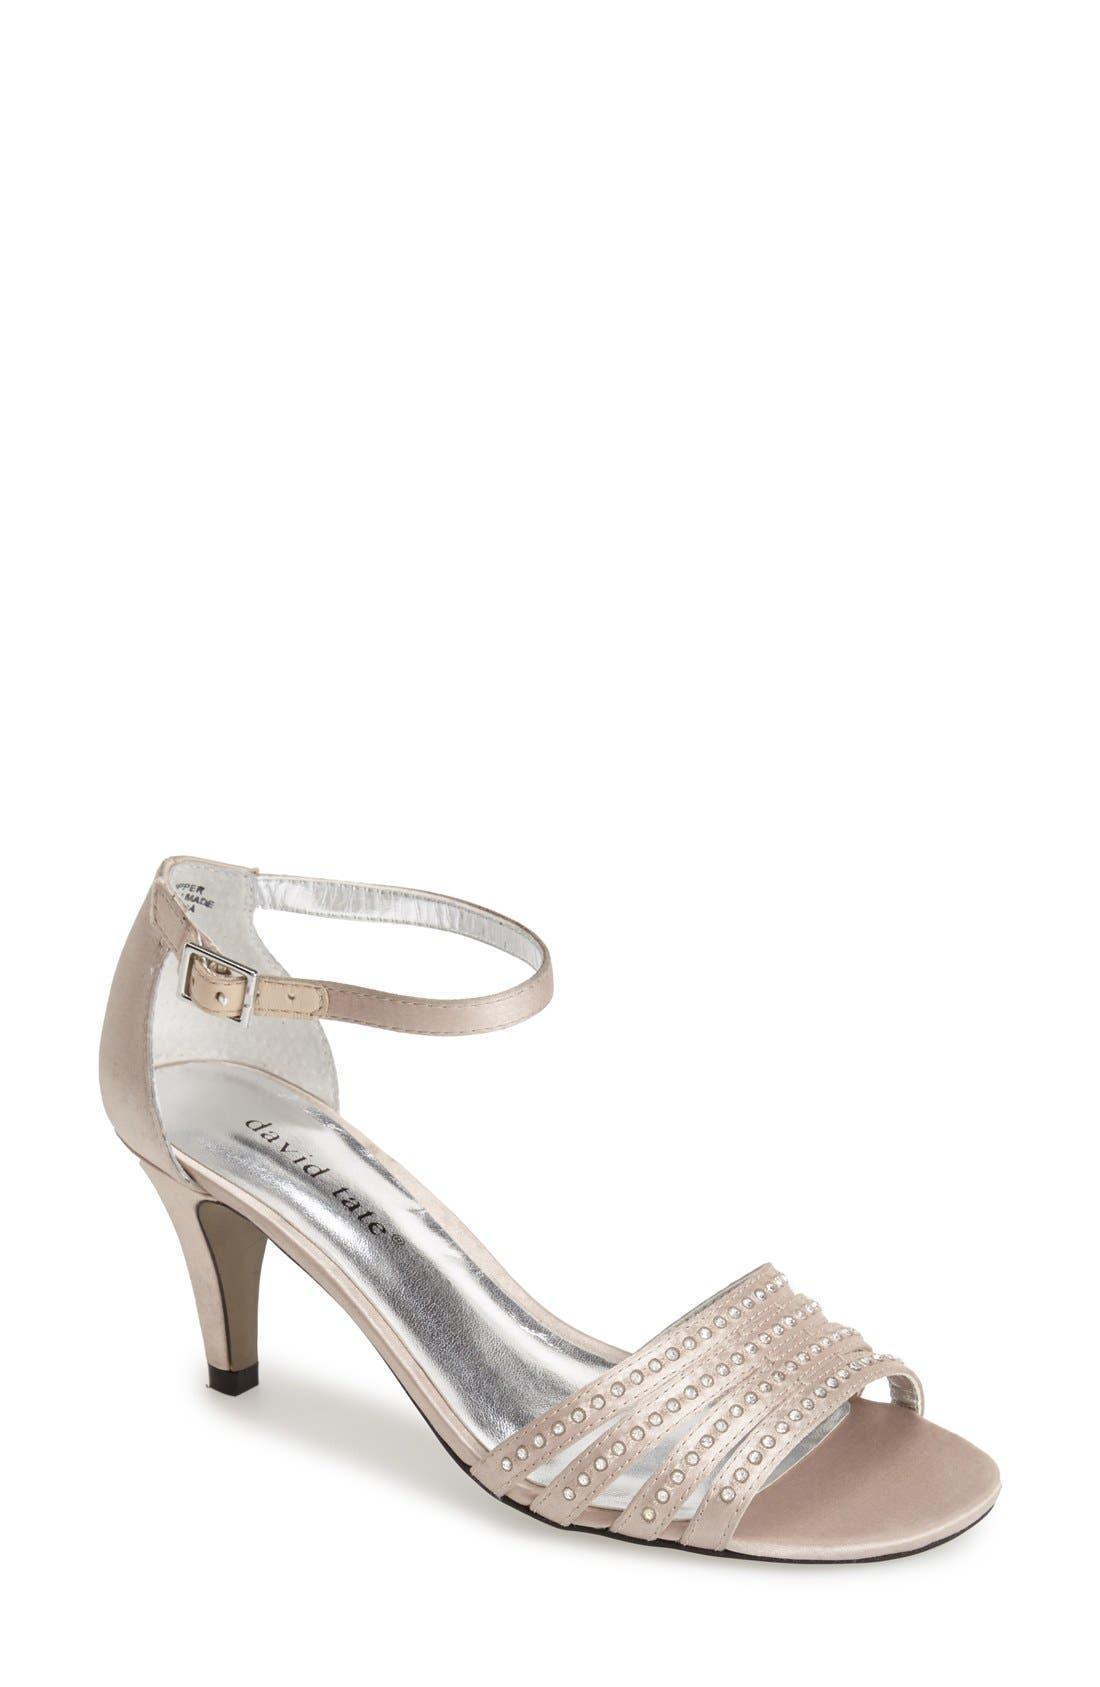 'Terra' Ankle Strap Sandal